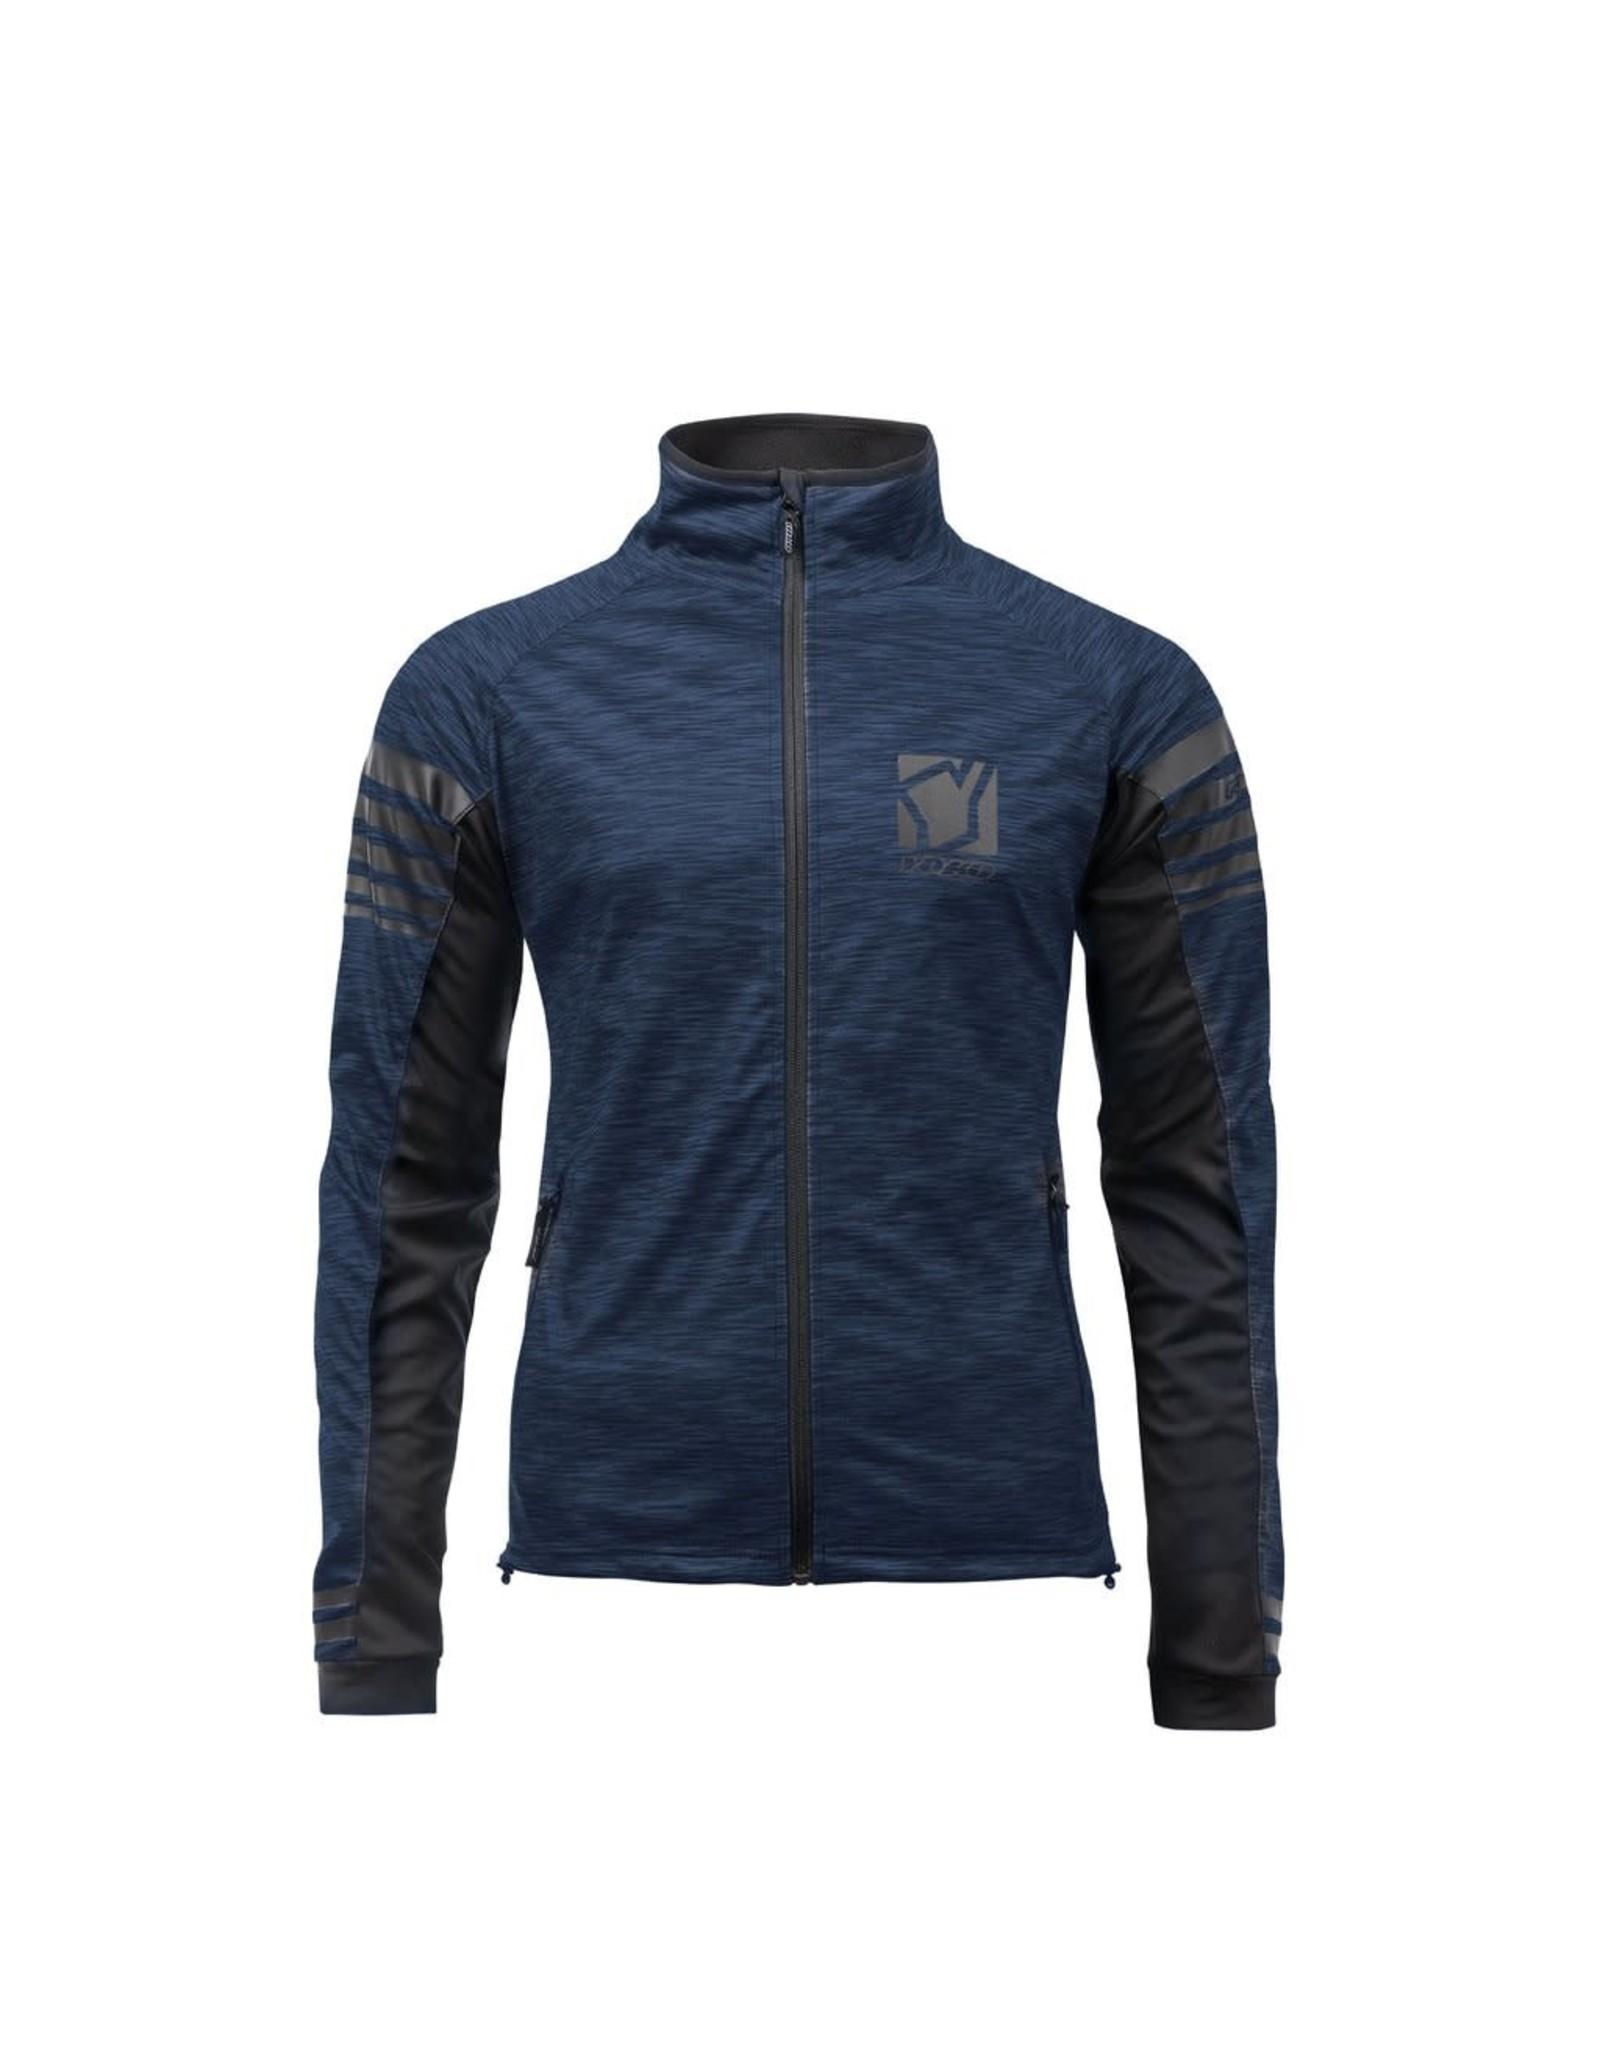 Yoko Yoko YXR Jacket Men's